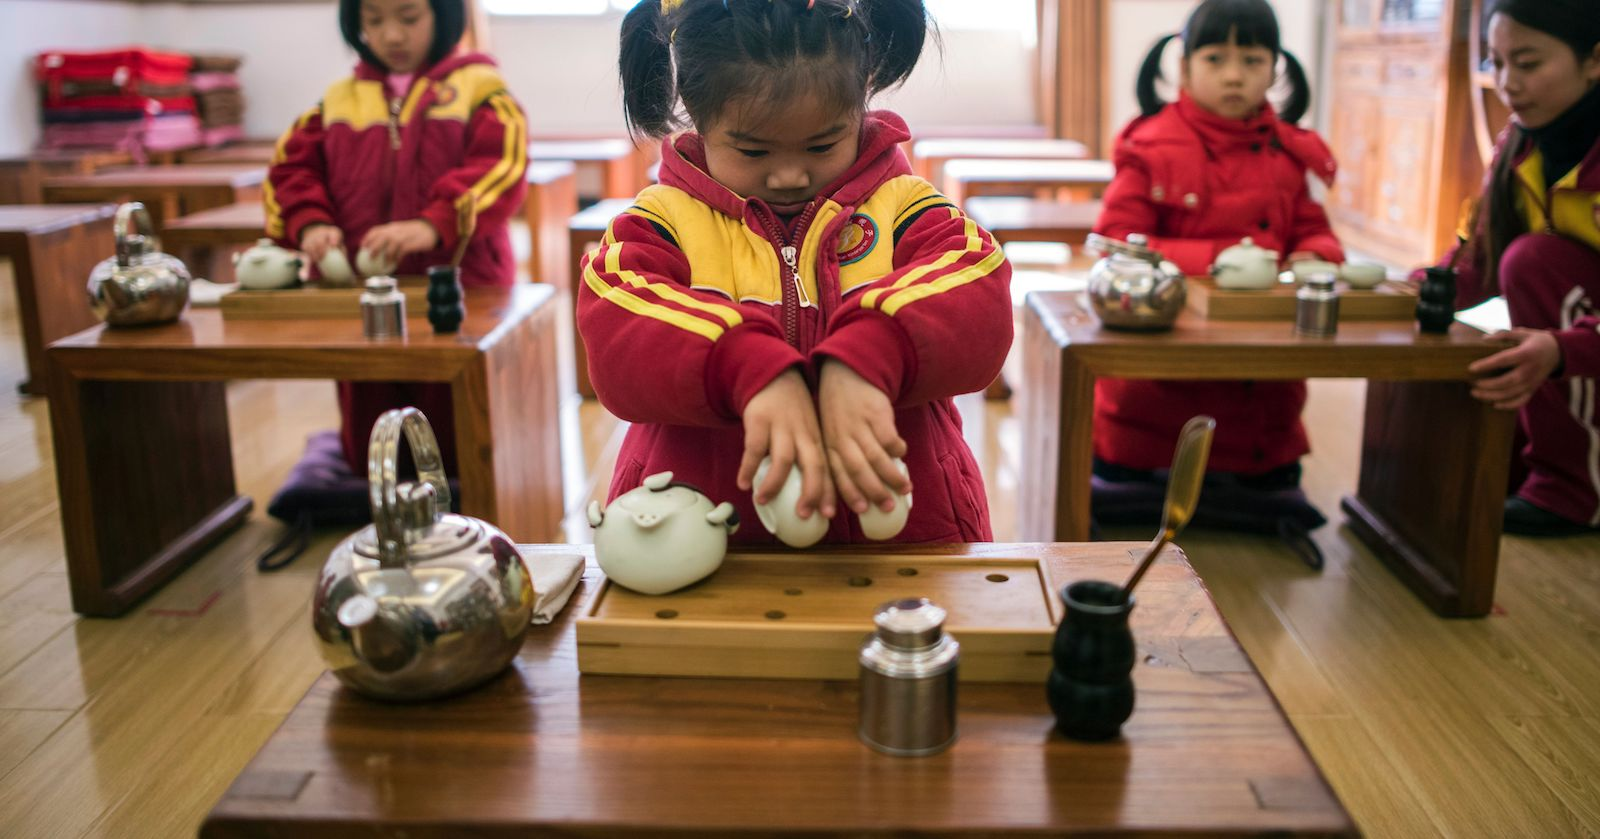 Girls learning to perform a tea ceremony in kindergarten. (Photo: Johannes Eisele via Getty)